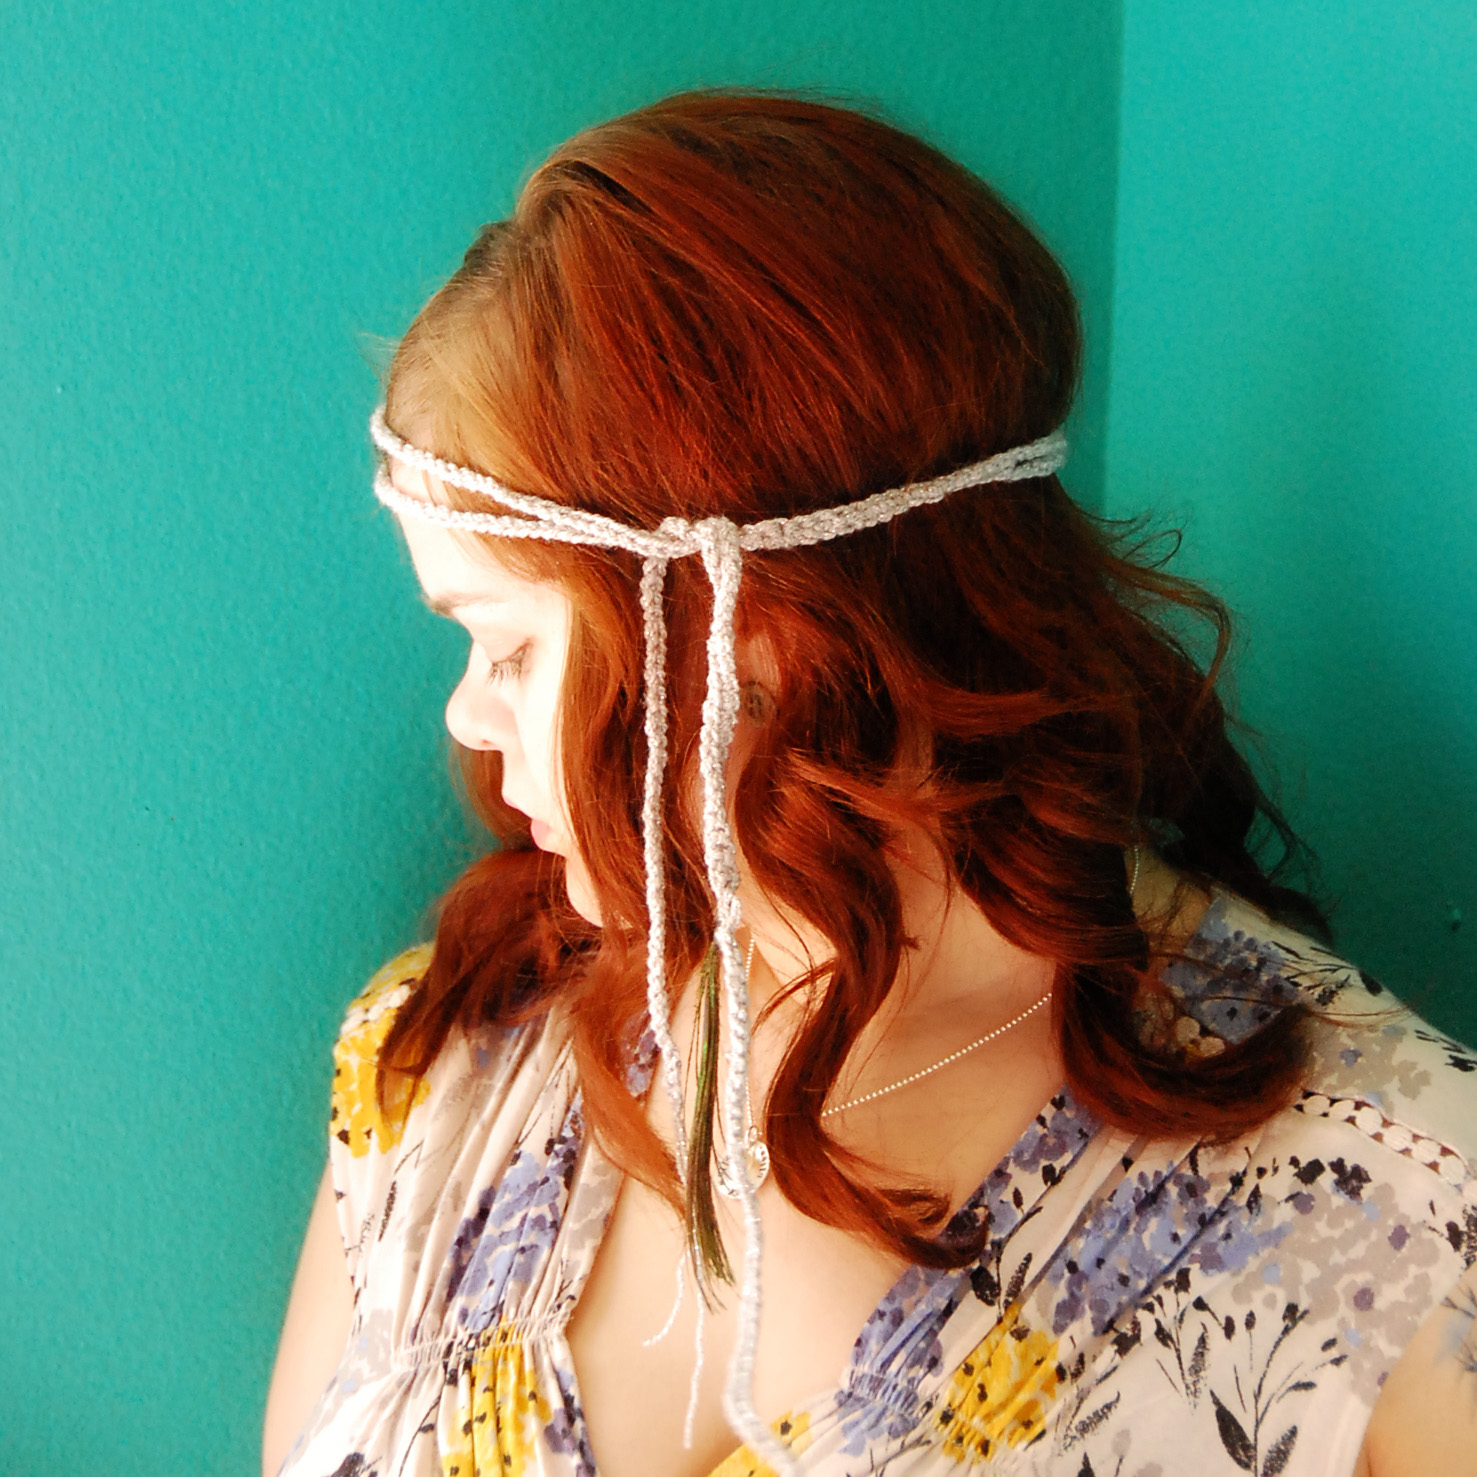 Citizen K Crocheted Hippie Headbands